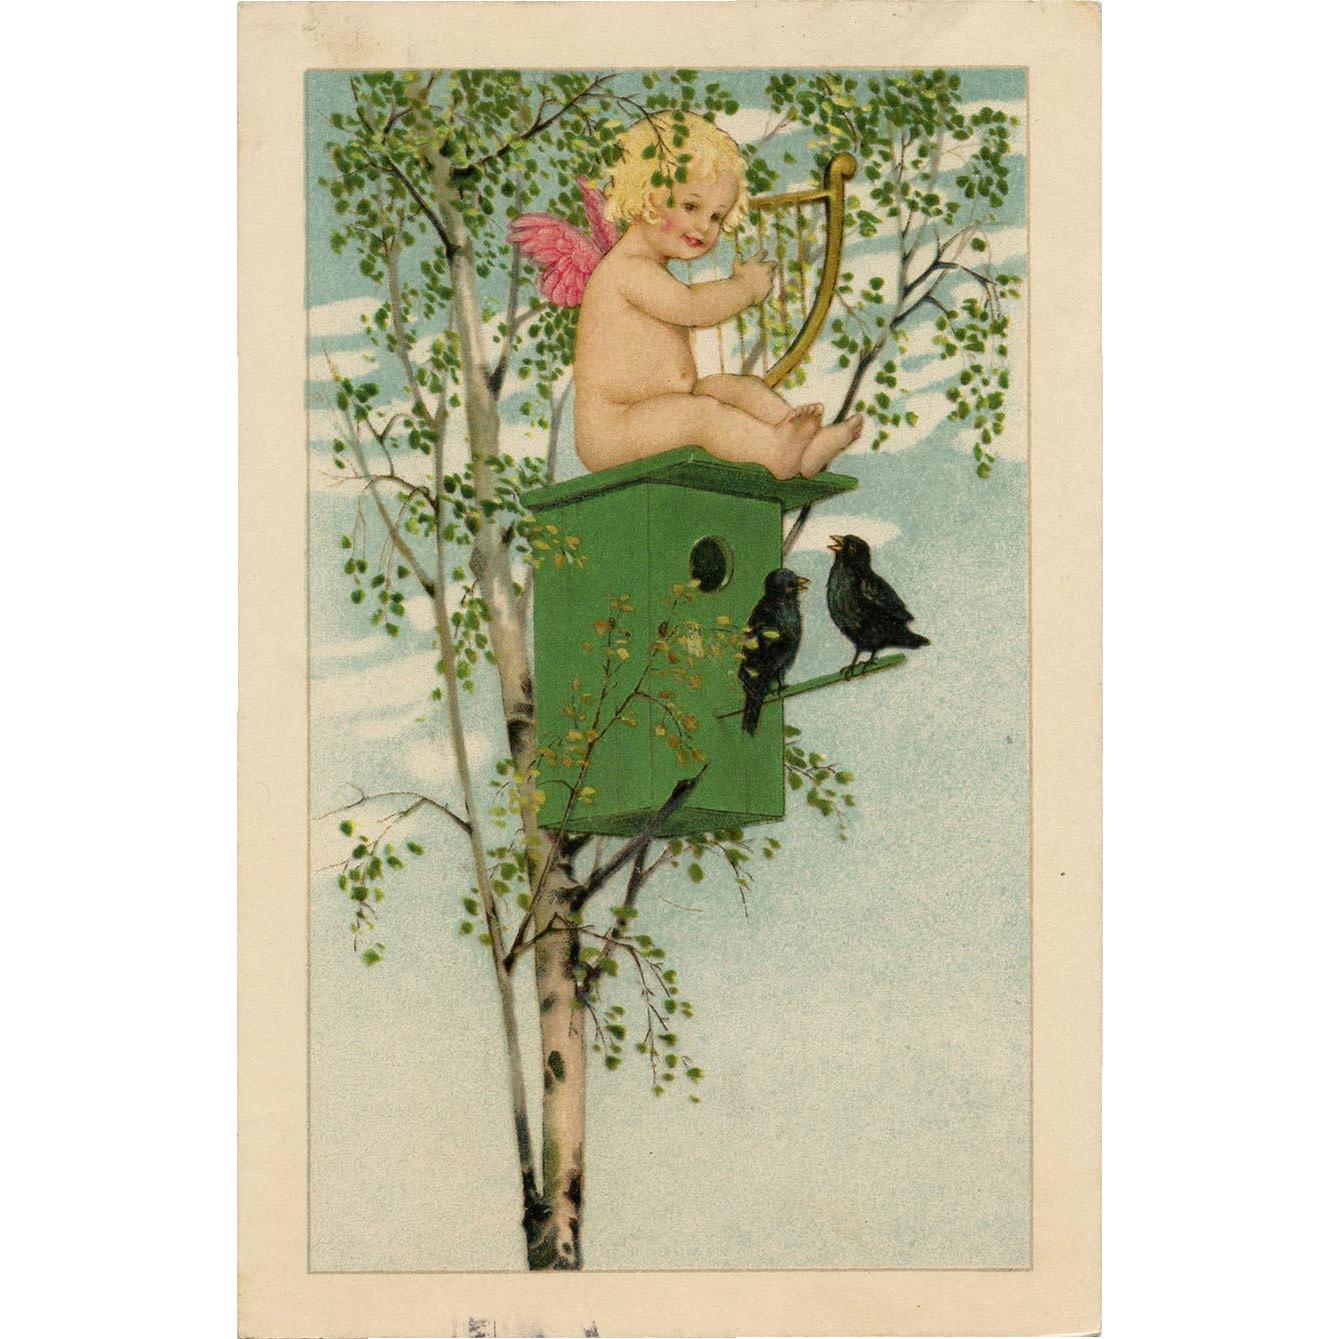 Cupid Playing Harp Atop Birdhouse in Tree Marie Flatscher Vienne Postcard